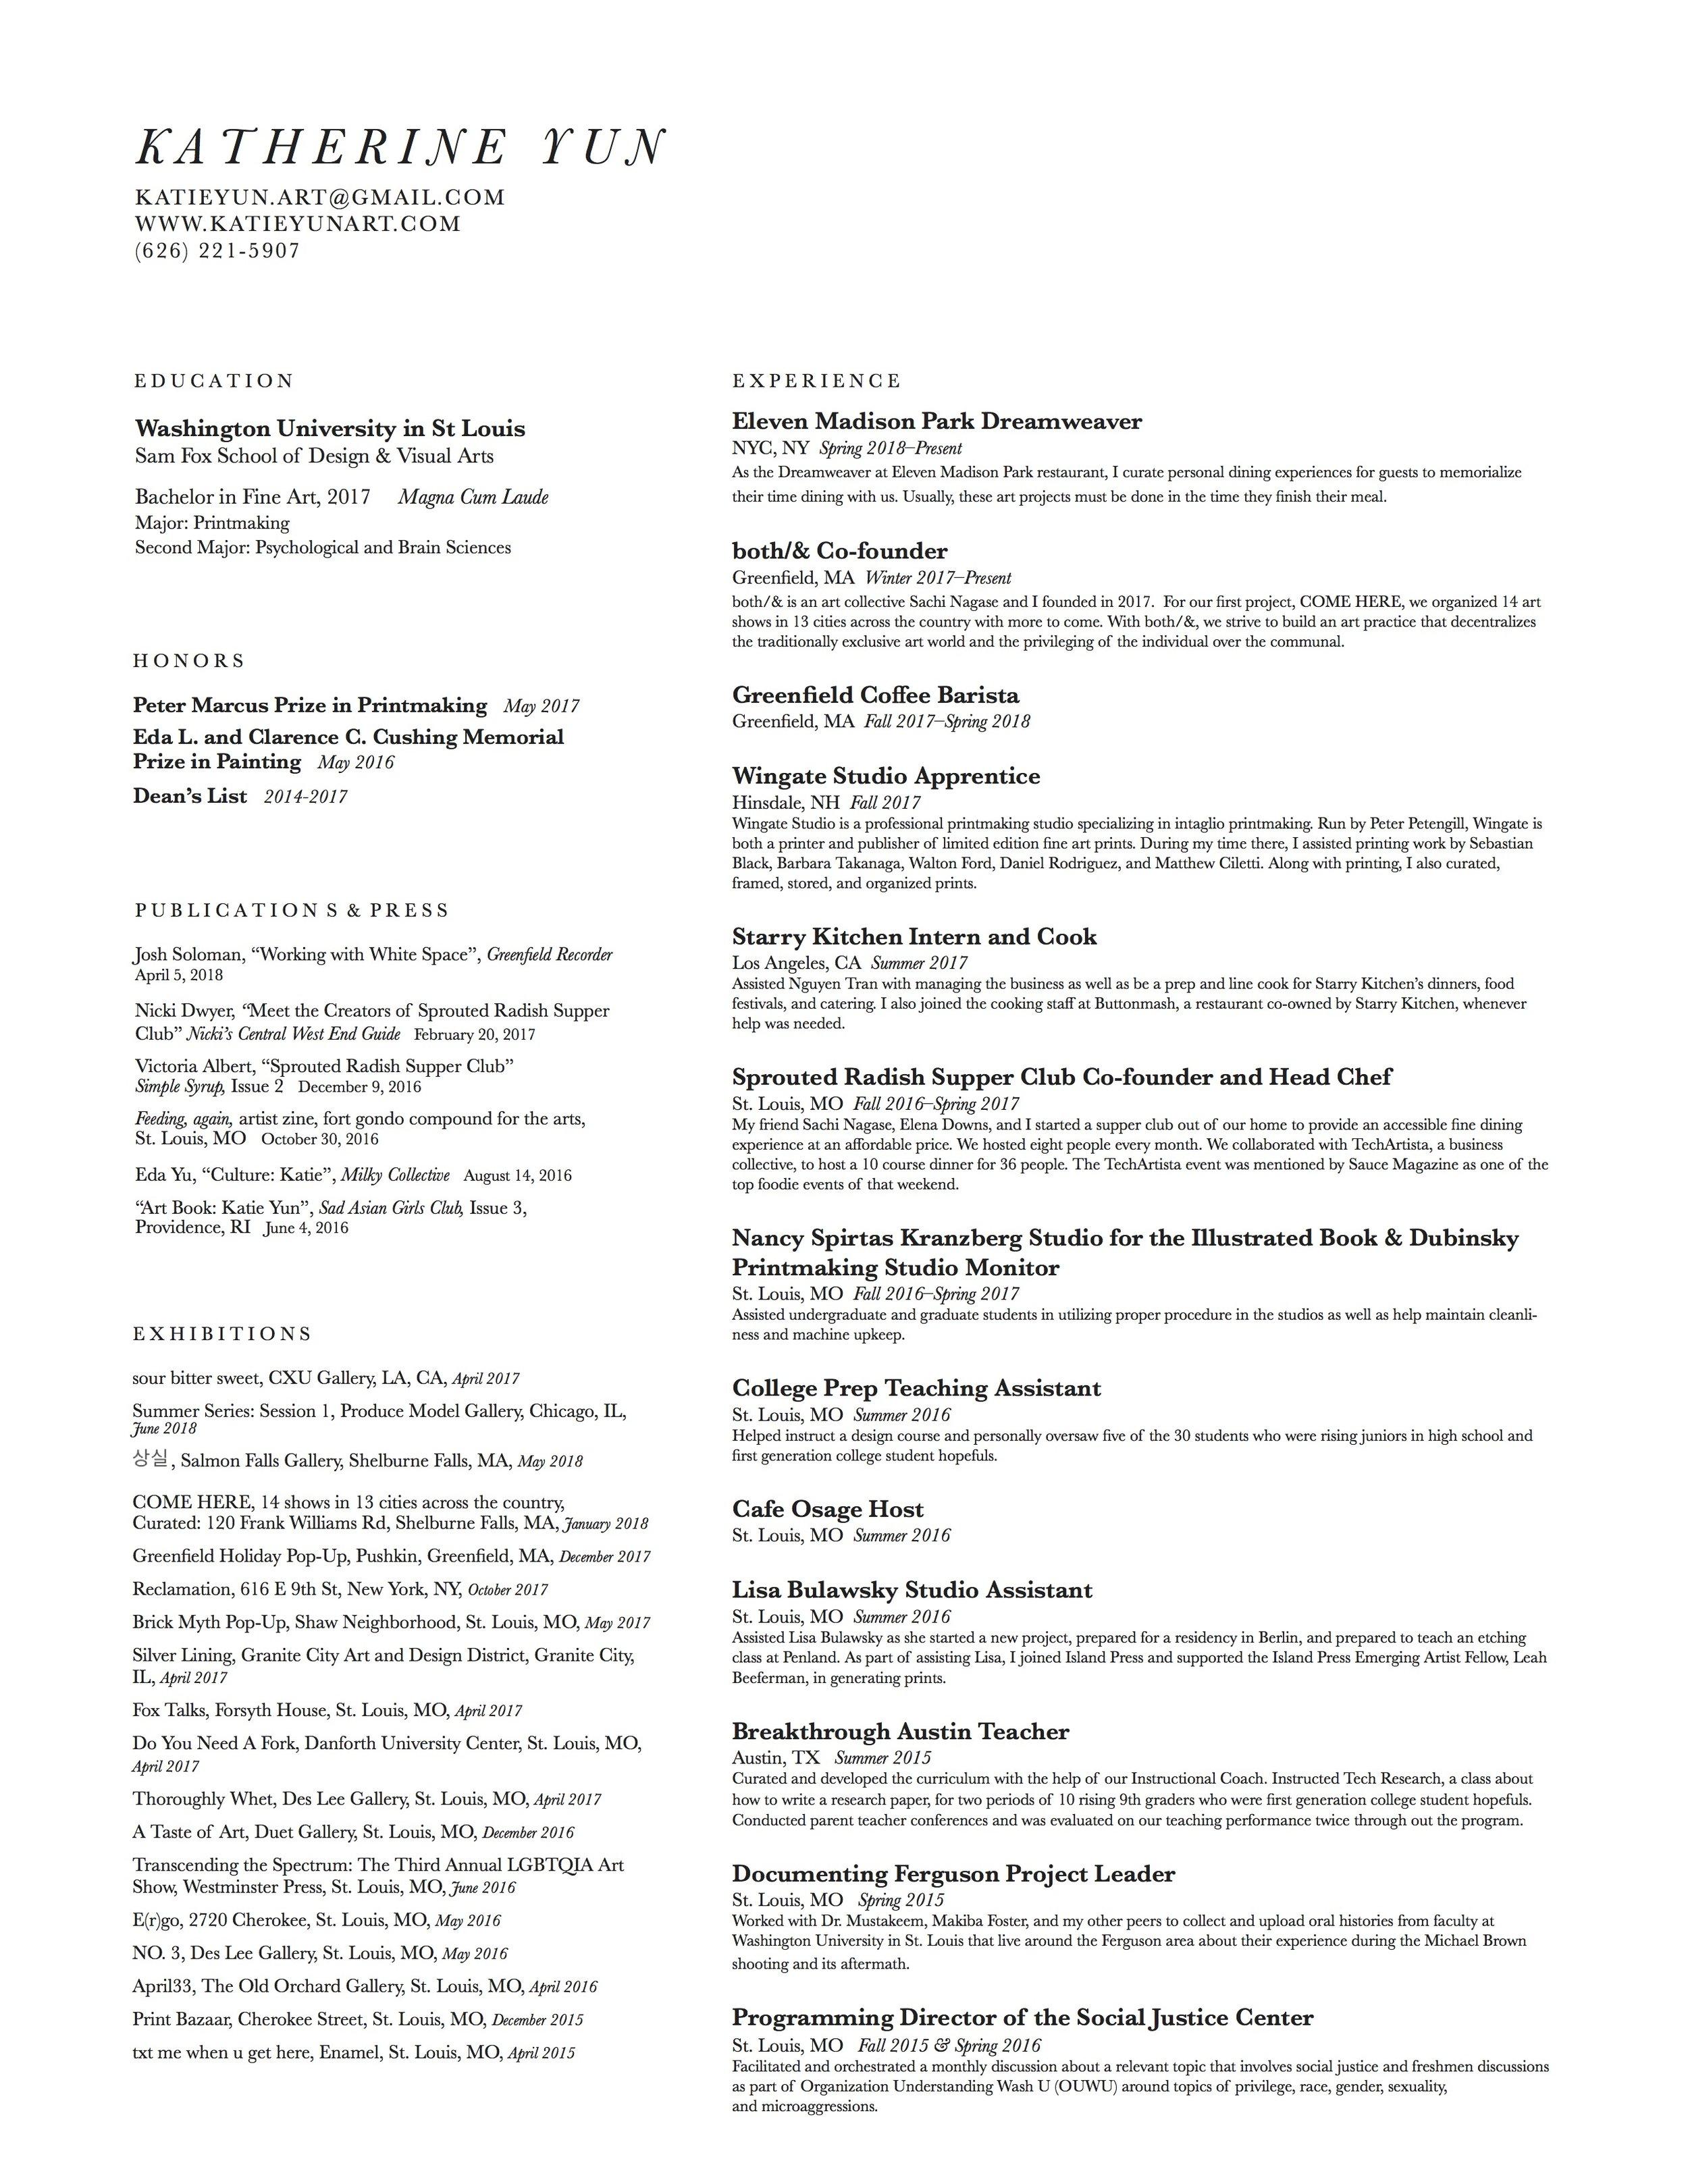 Download Resume